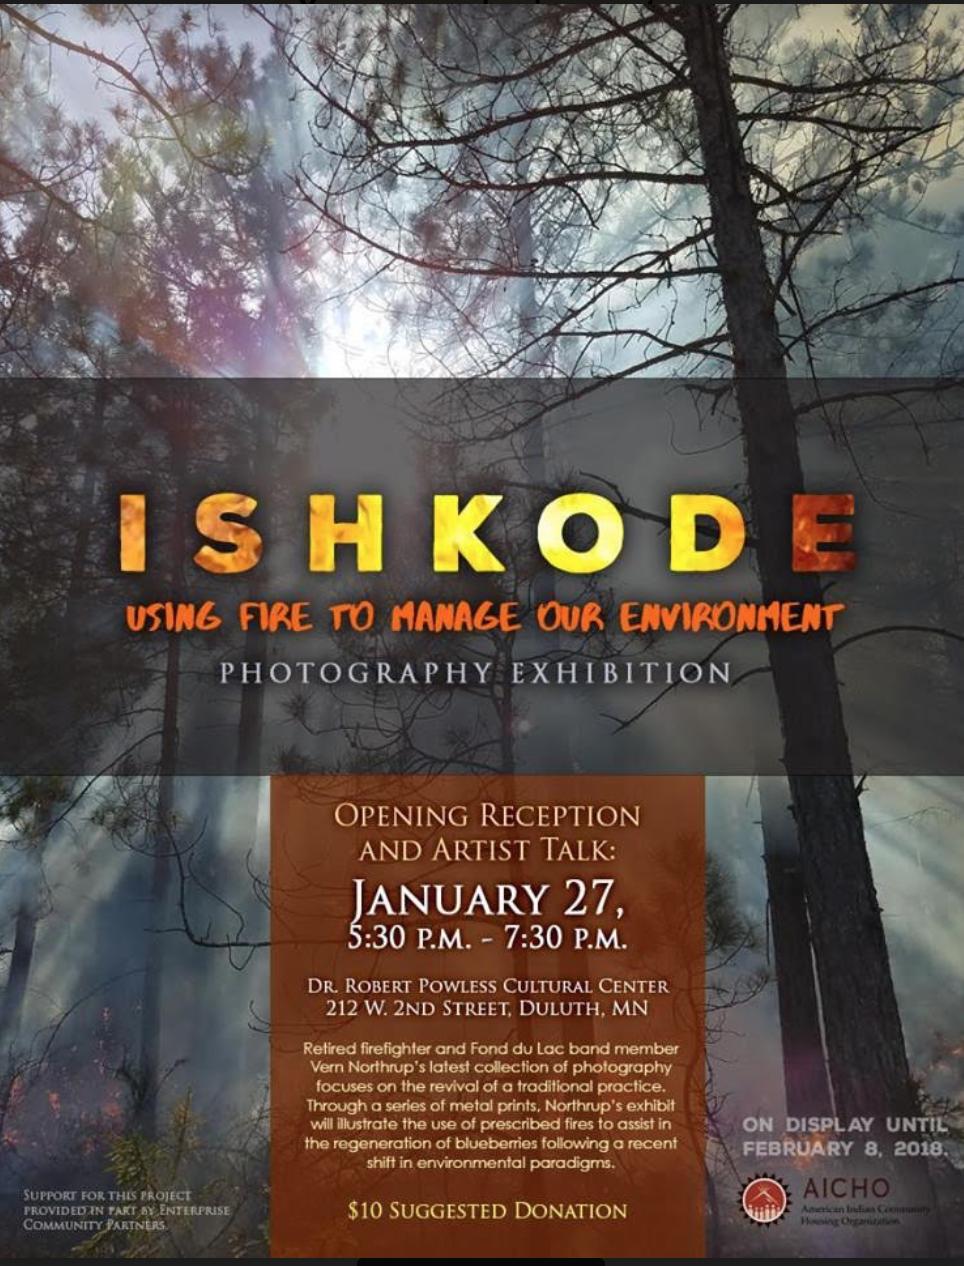 Minnesota Native News: Ishkode Photography Exhibit at AICHO